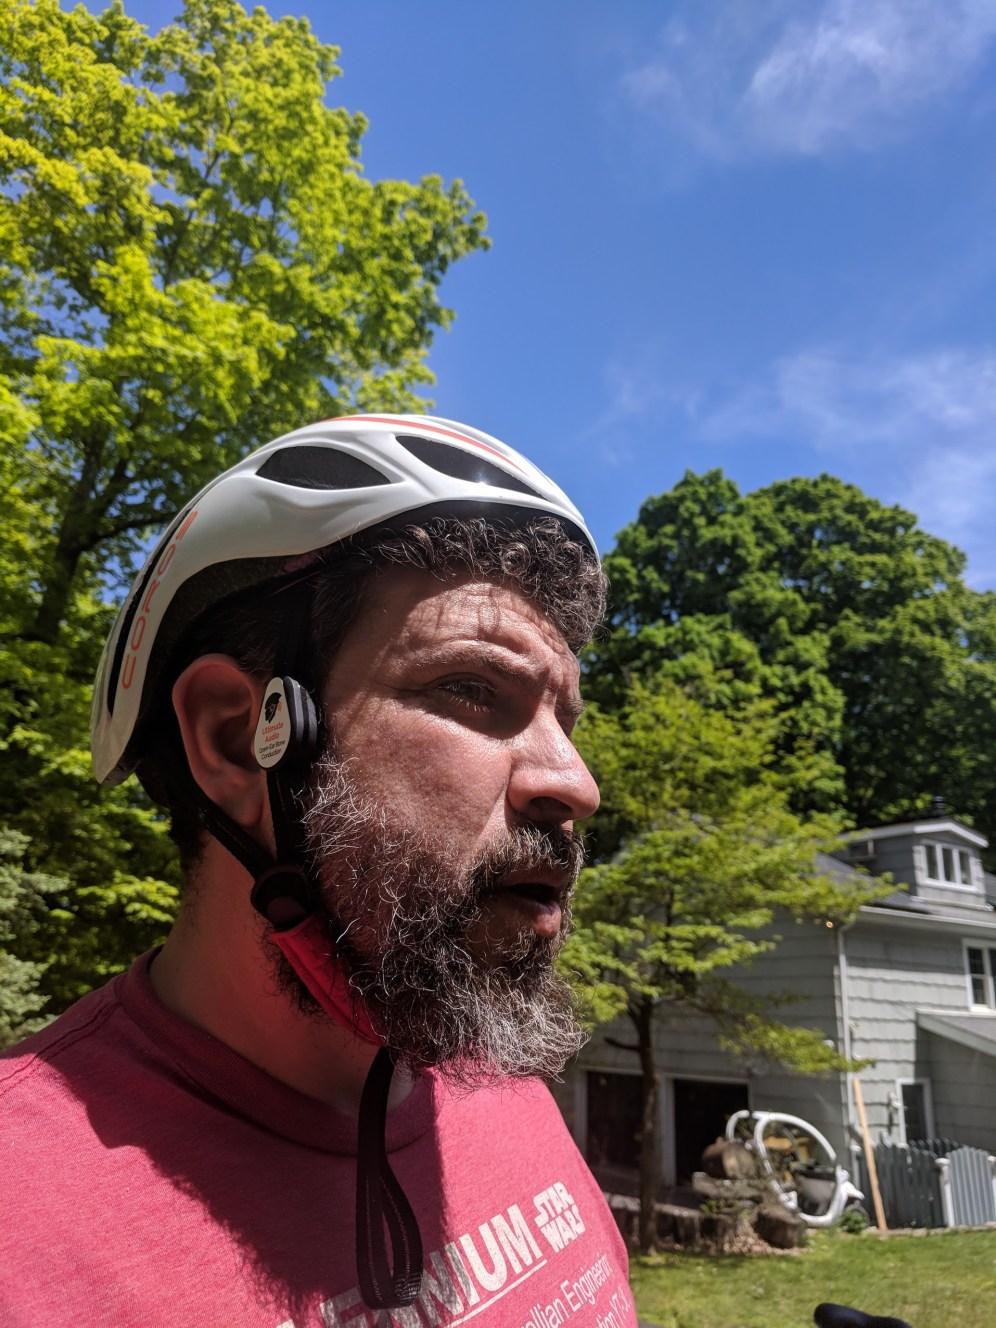 Coros-bluetooth-bike helmet-review